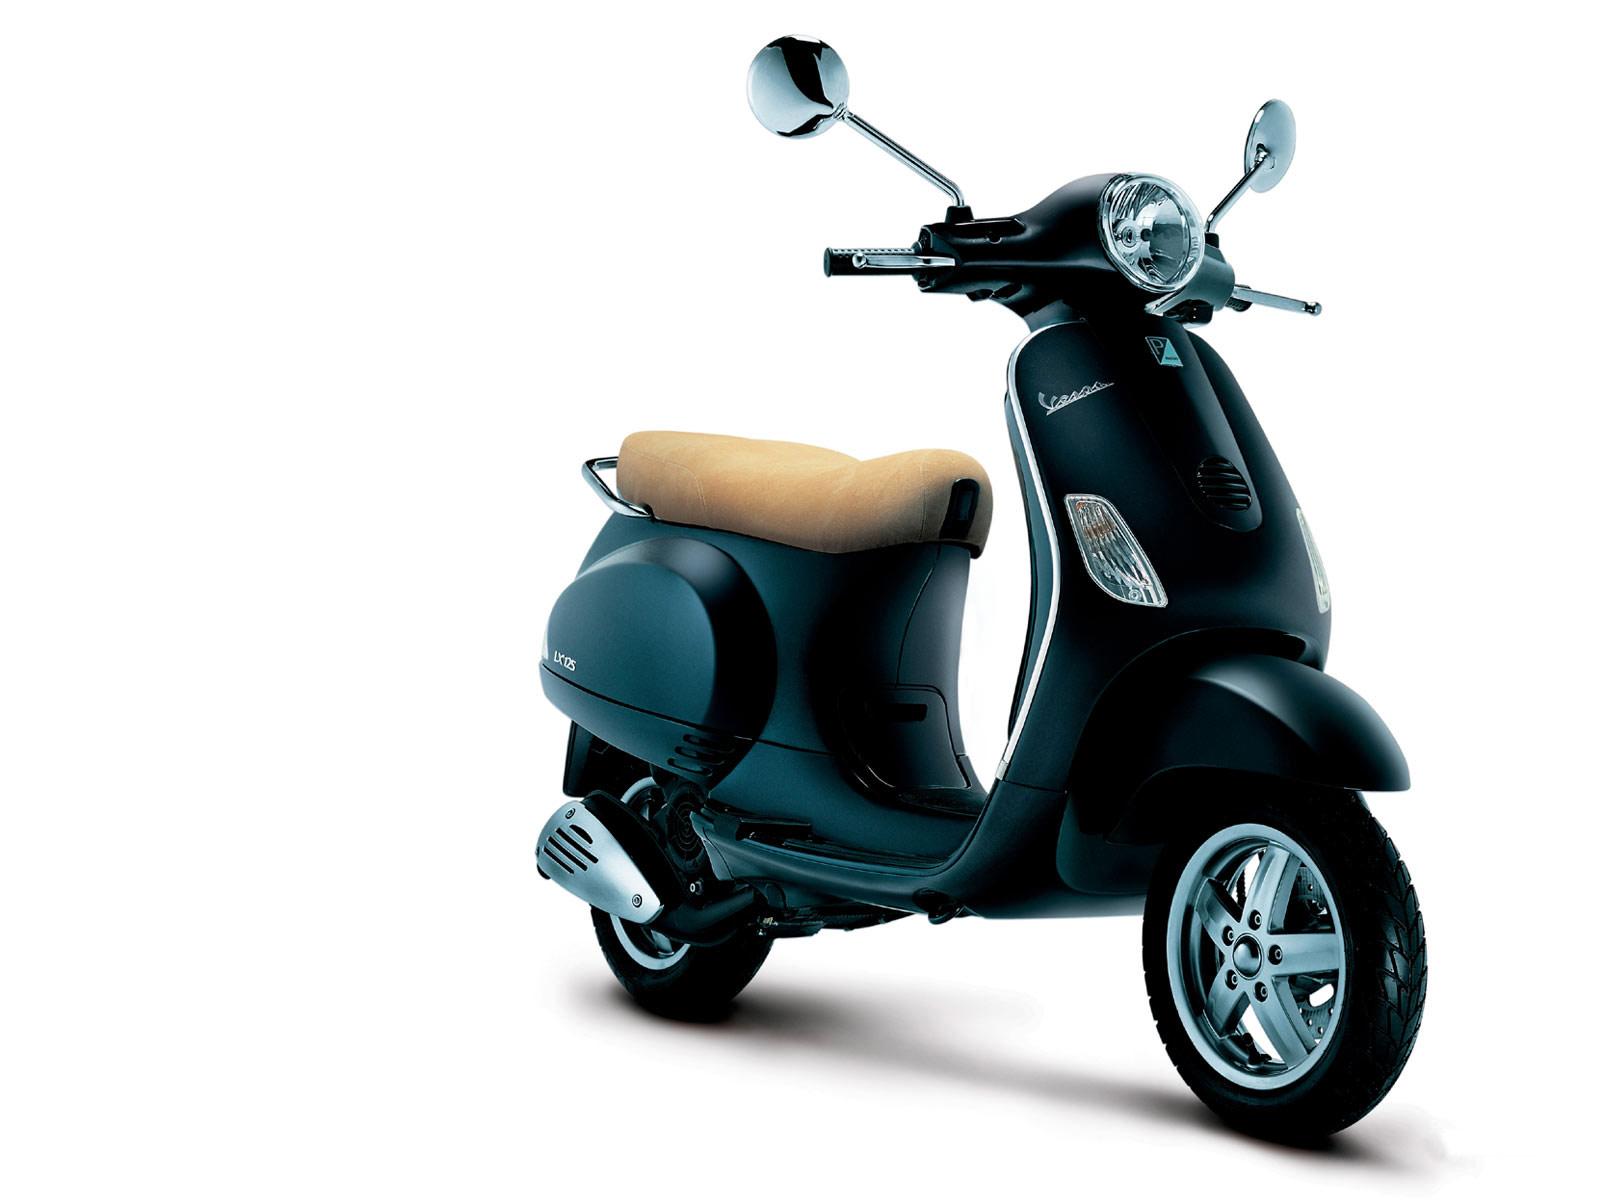 vespa lx125 insurance info 2007 scooter pictures. Black Bedroom Furniture Sets. Home Design Ideas